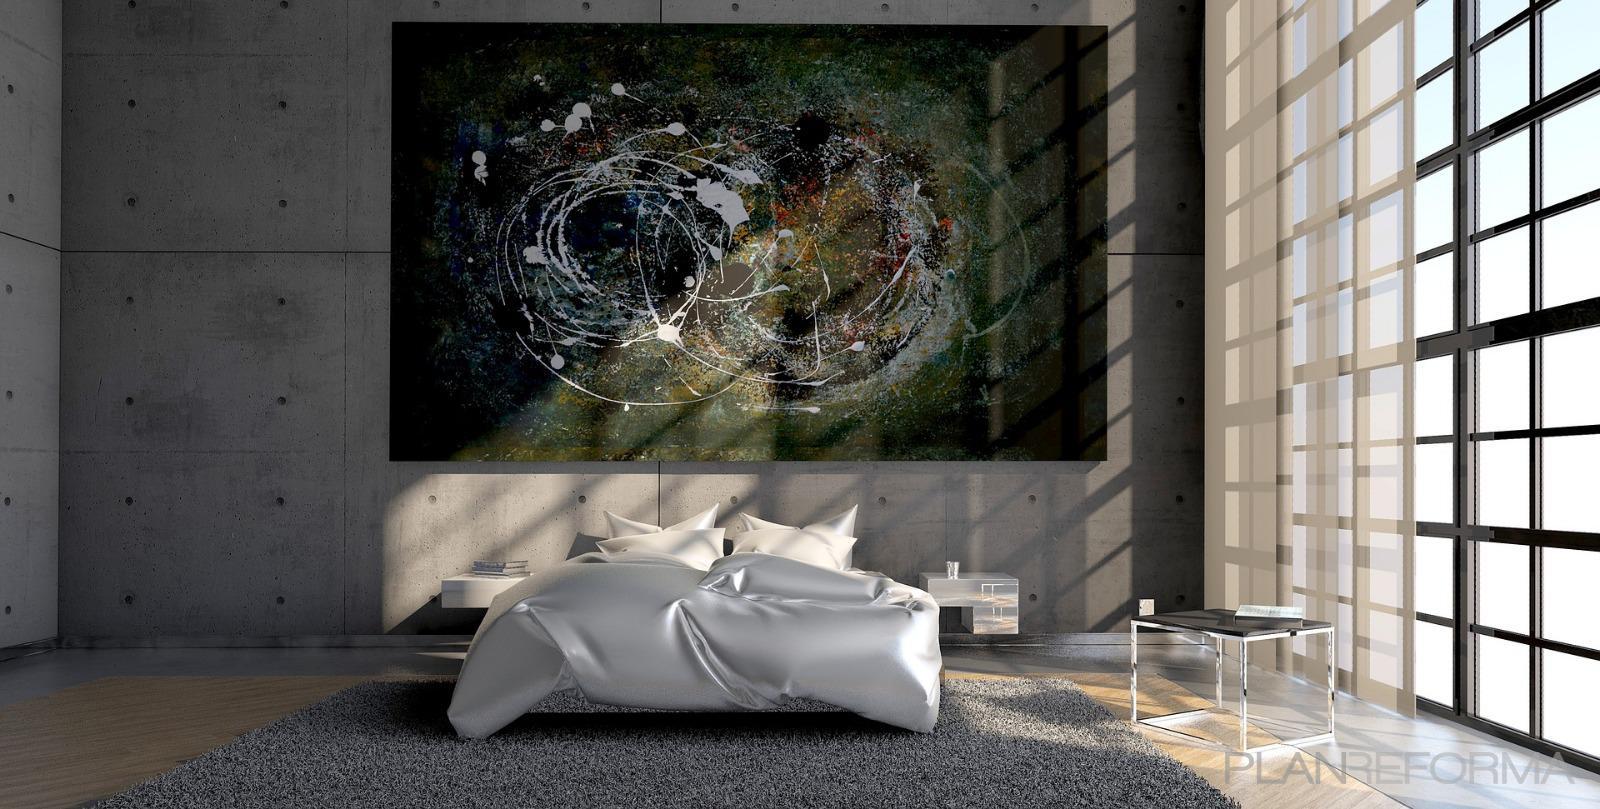 Dormitorio Estilo vintage Color gris  diseñado por REMMIR 2018 S.L | Gremio | Copyright REMMIR 2018 S.L